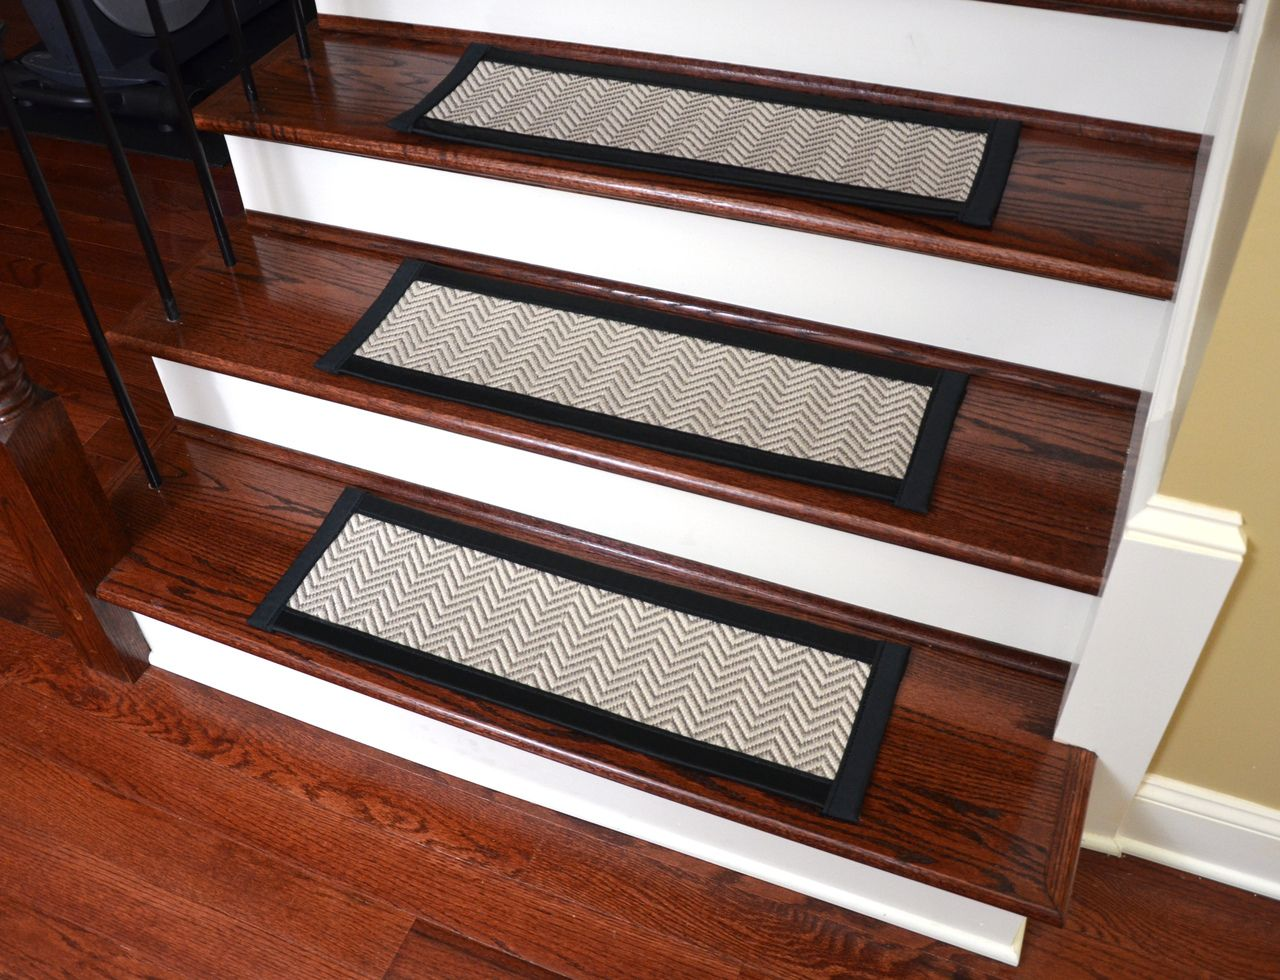 Best Dean Non Slip Tape Free Pet Friendly Dog Helper Stair 640 x 480